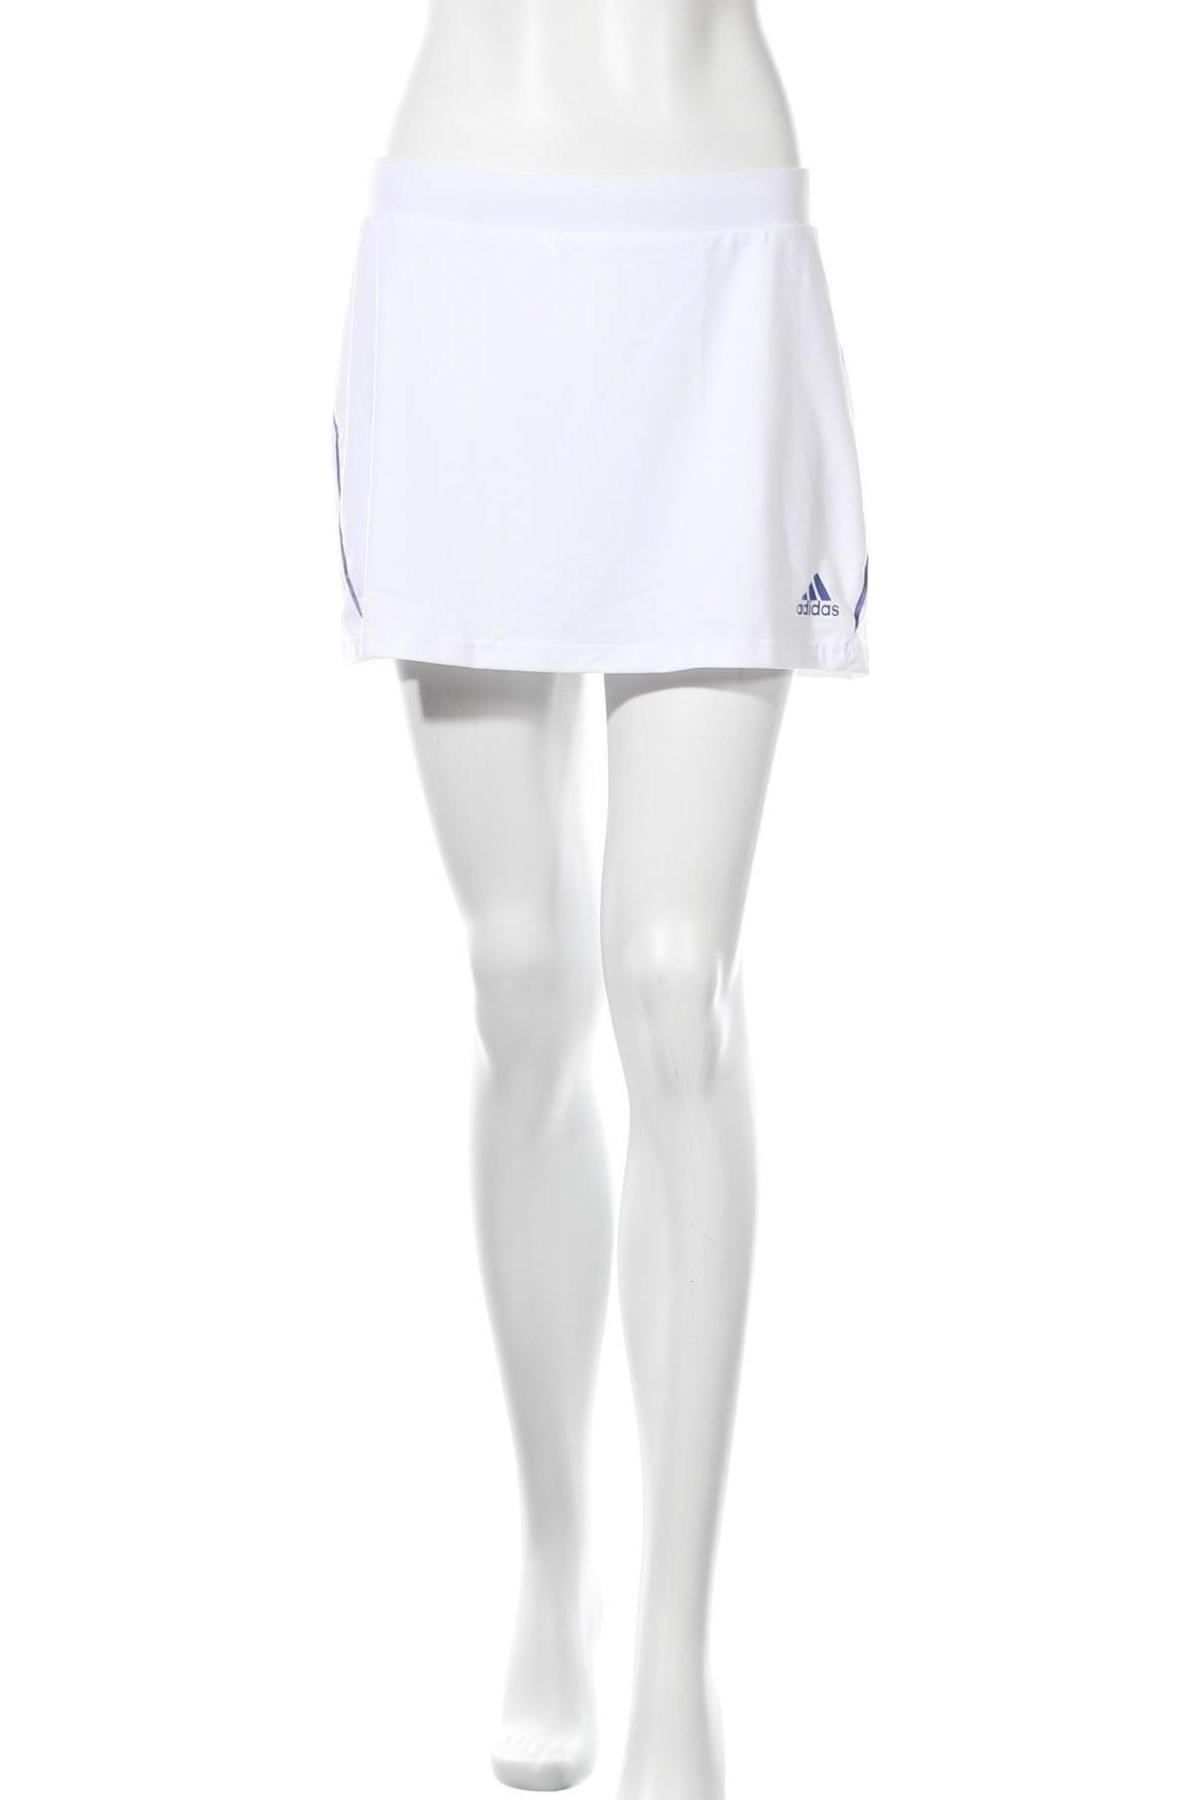 Пола - панталон Adidas, Размер L, Цвят Бял, 82% полиестер, 18% еластан, Цена 23,70лв.